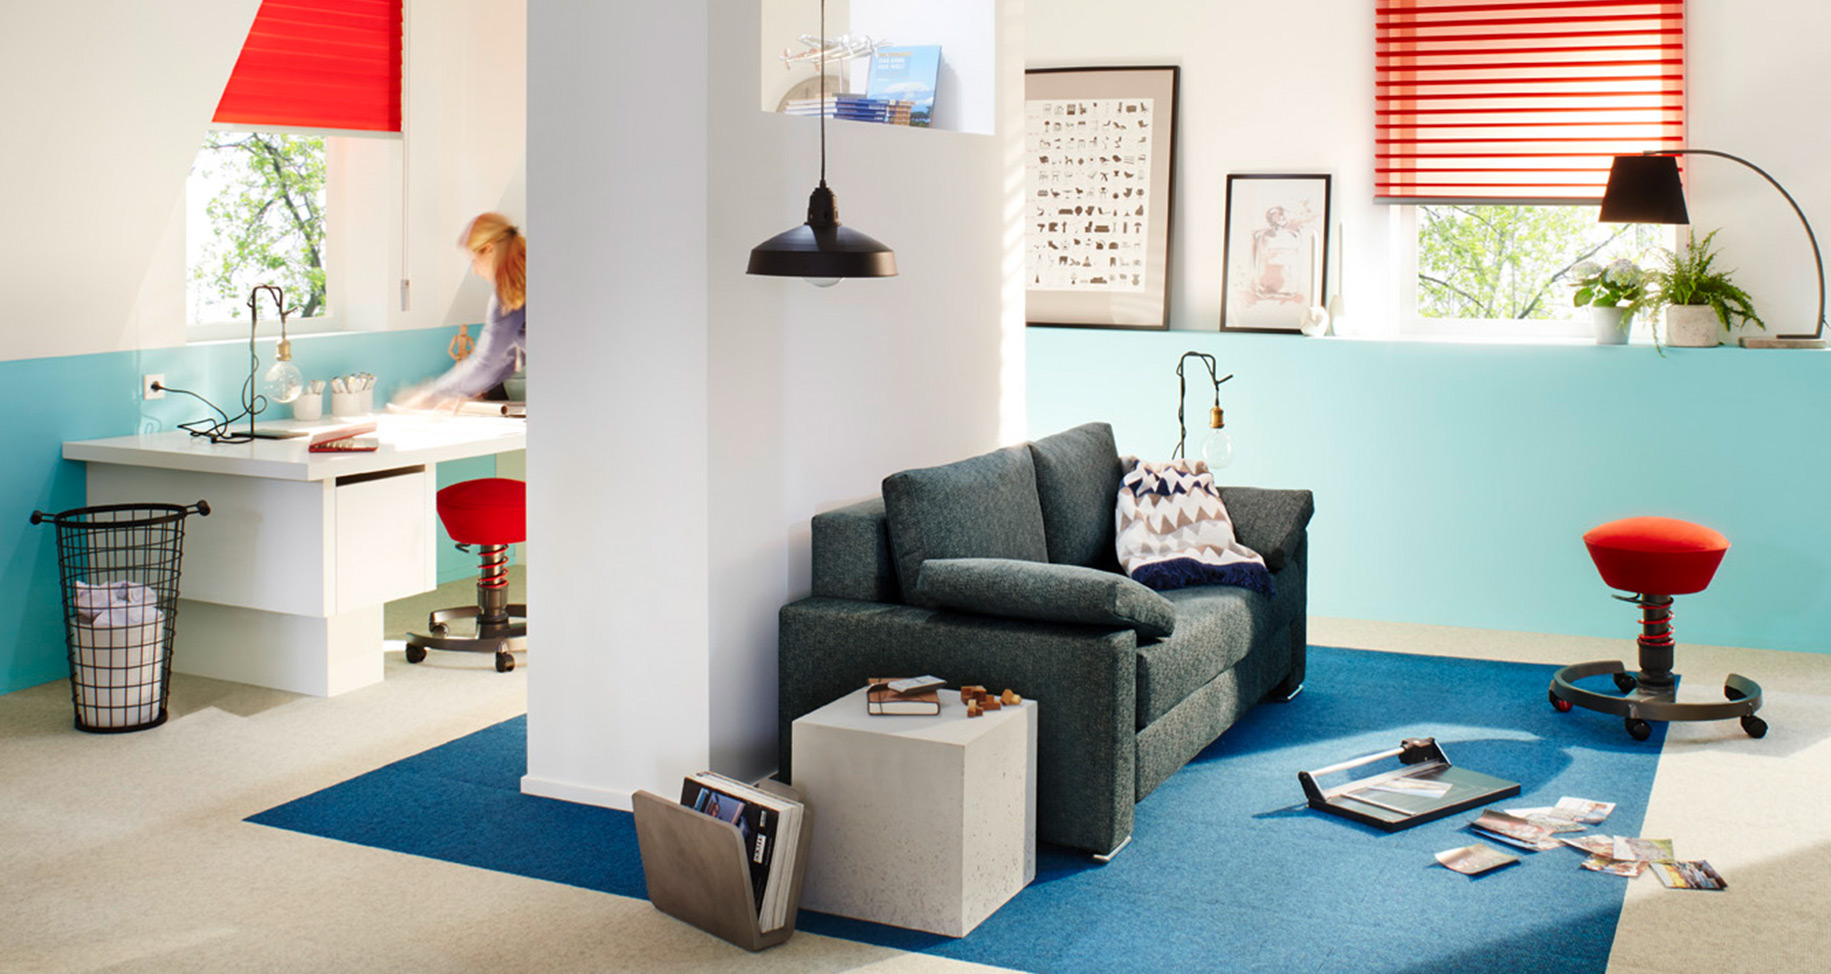 swopper pflegehinweise carala. Black Bedroom Furniture Sets. Home Design Ideas